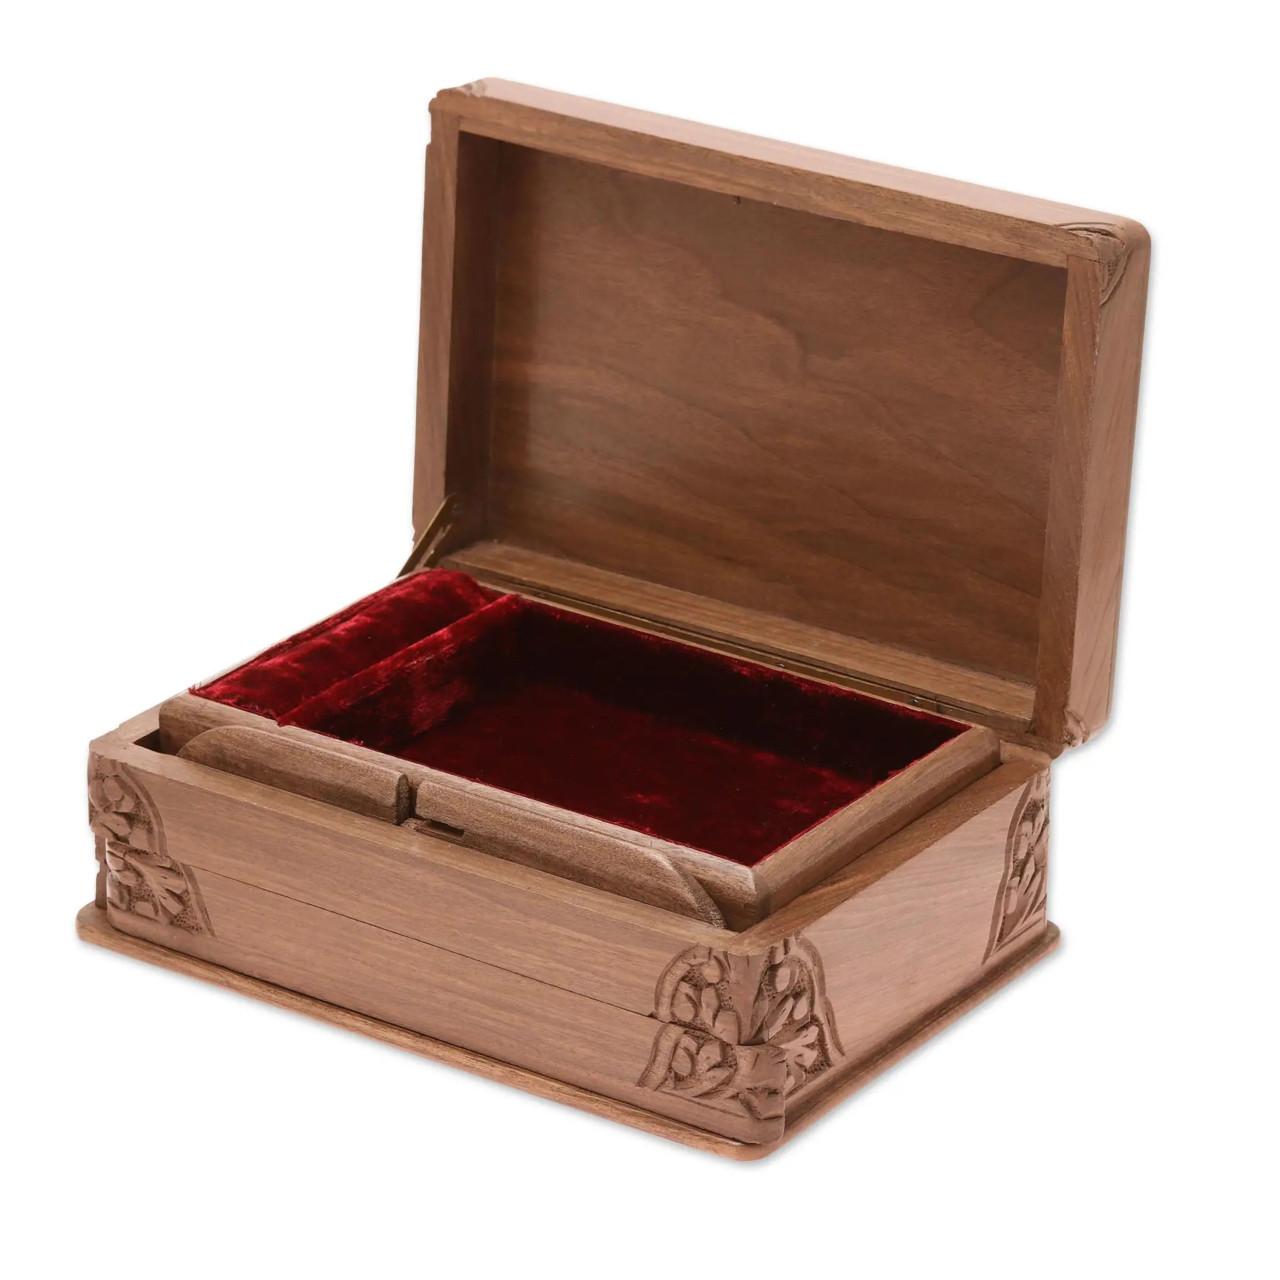 "Handmade Jewellery Box ""Cherished"" - Top"